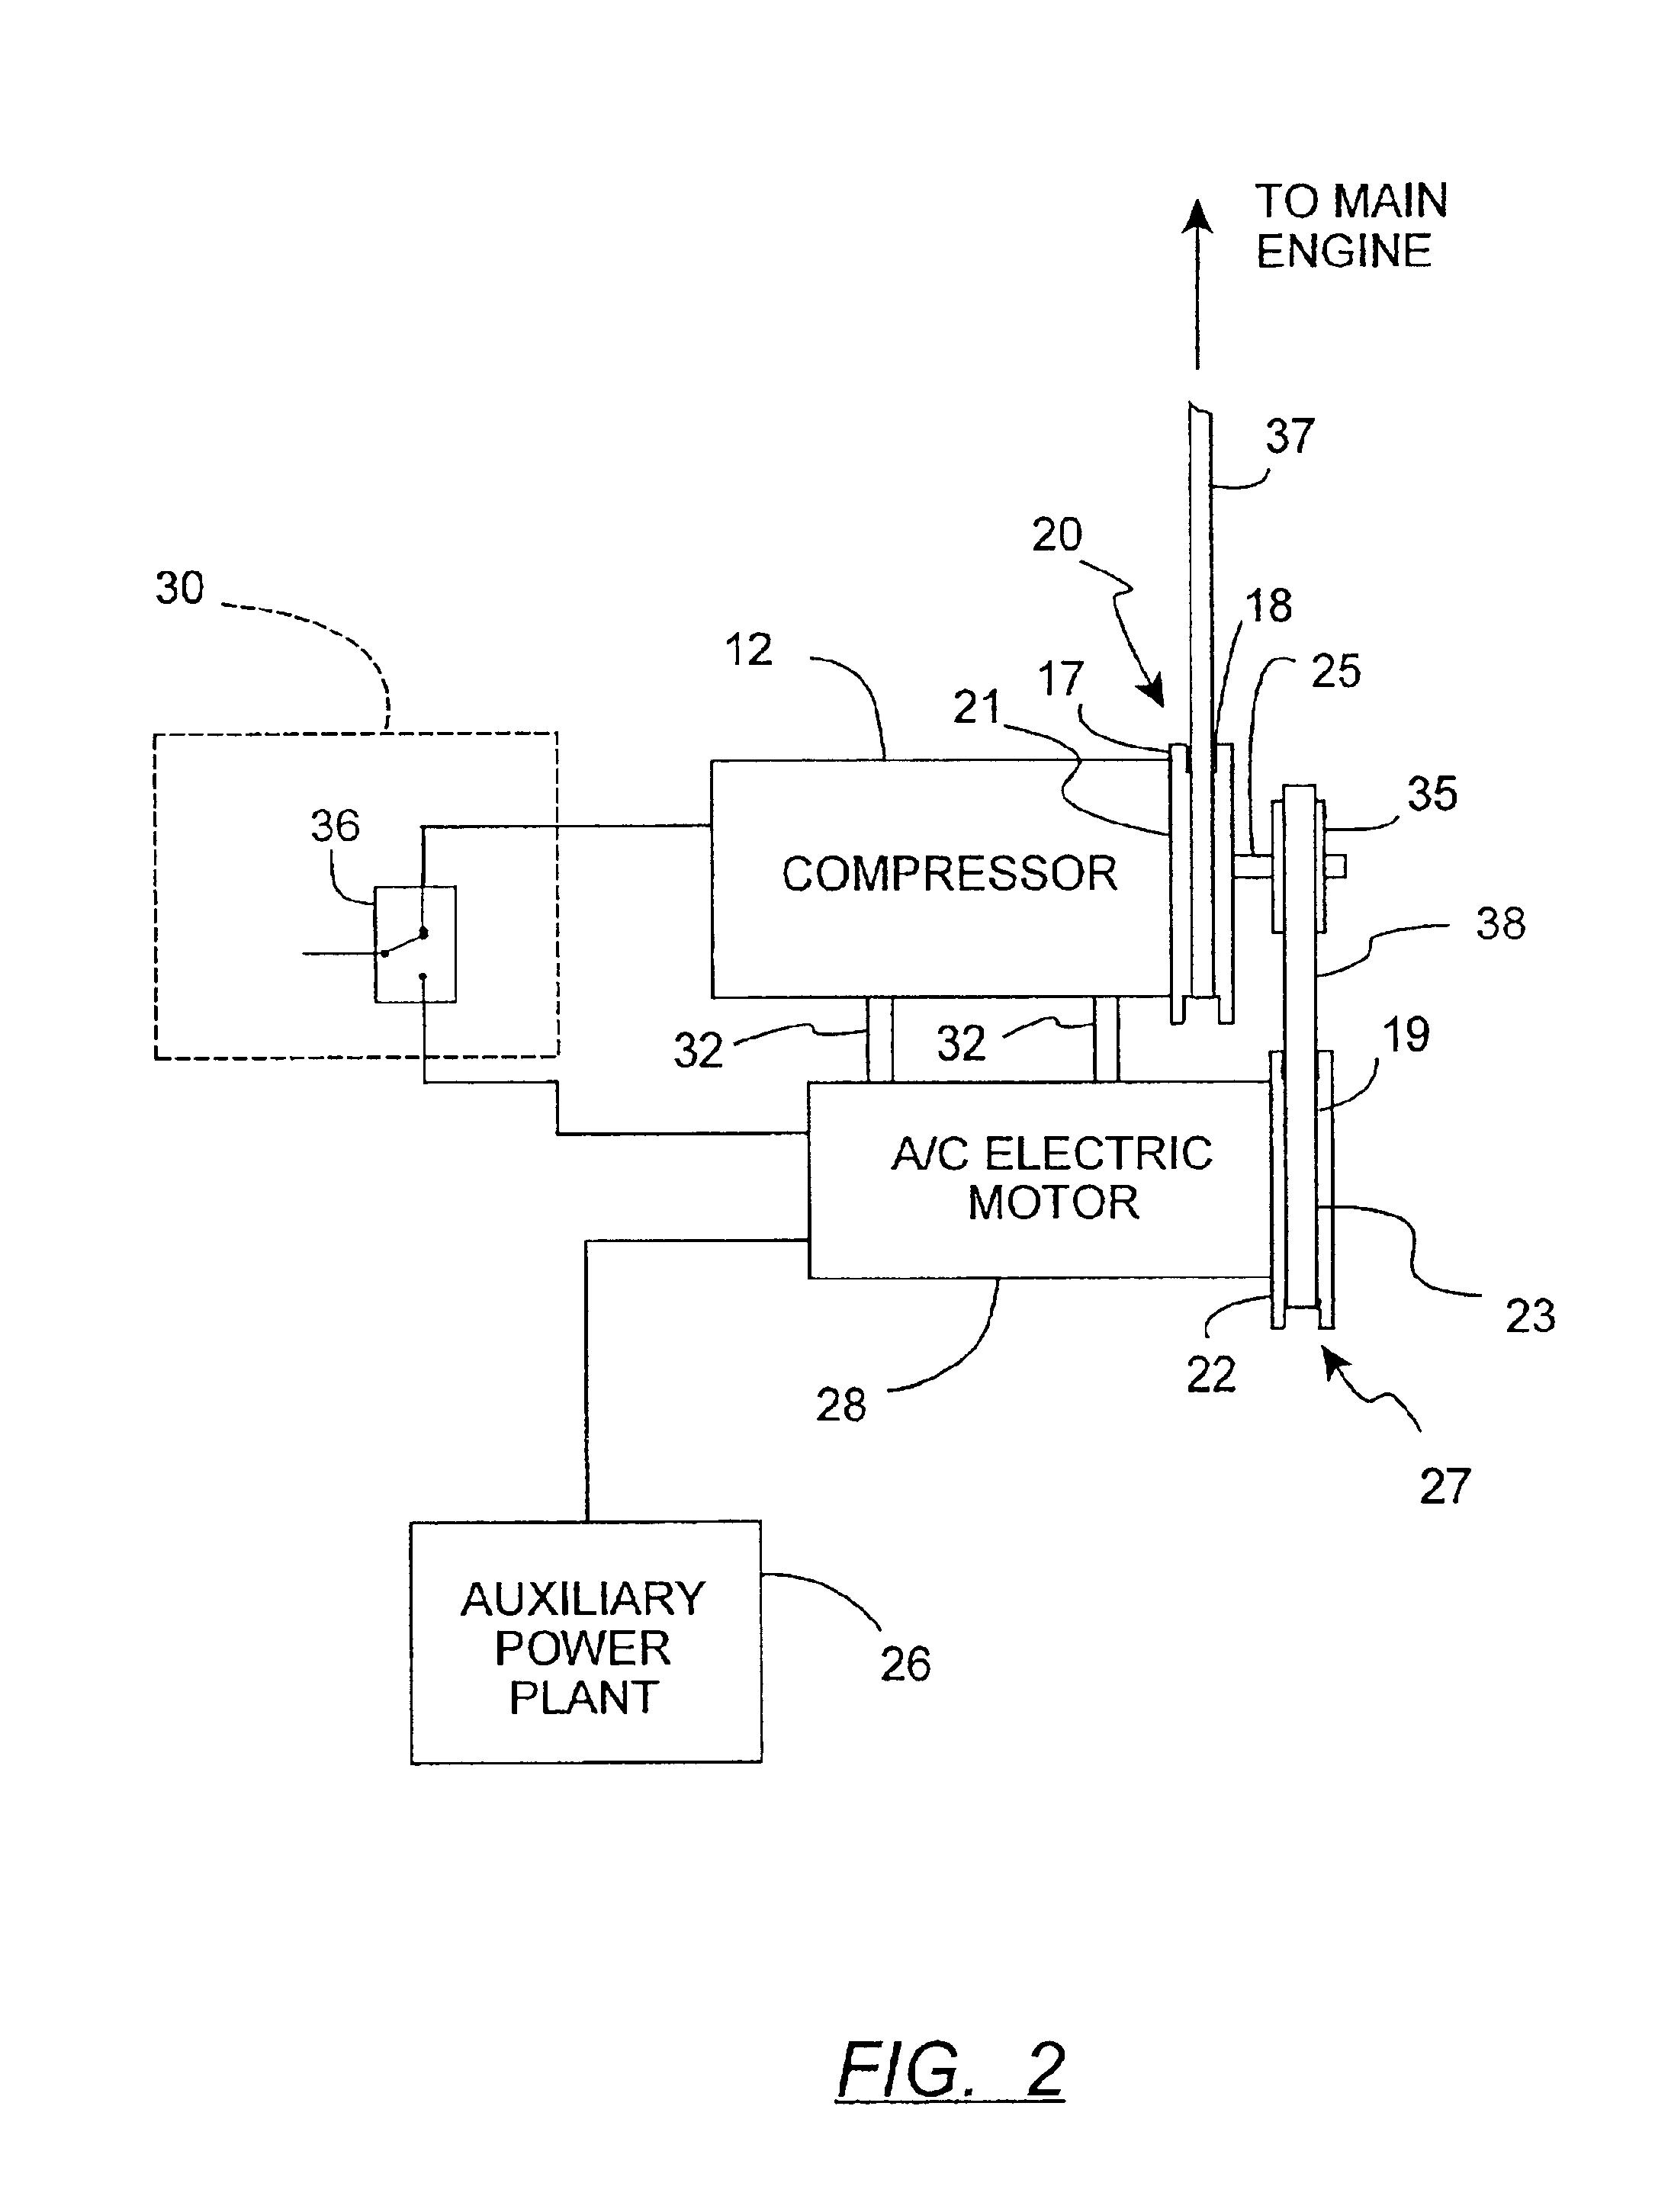 2011 bmw s1000rr wiring diagram wiring diagram bmw k1200